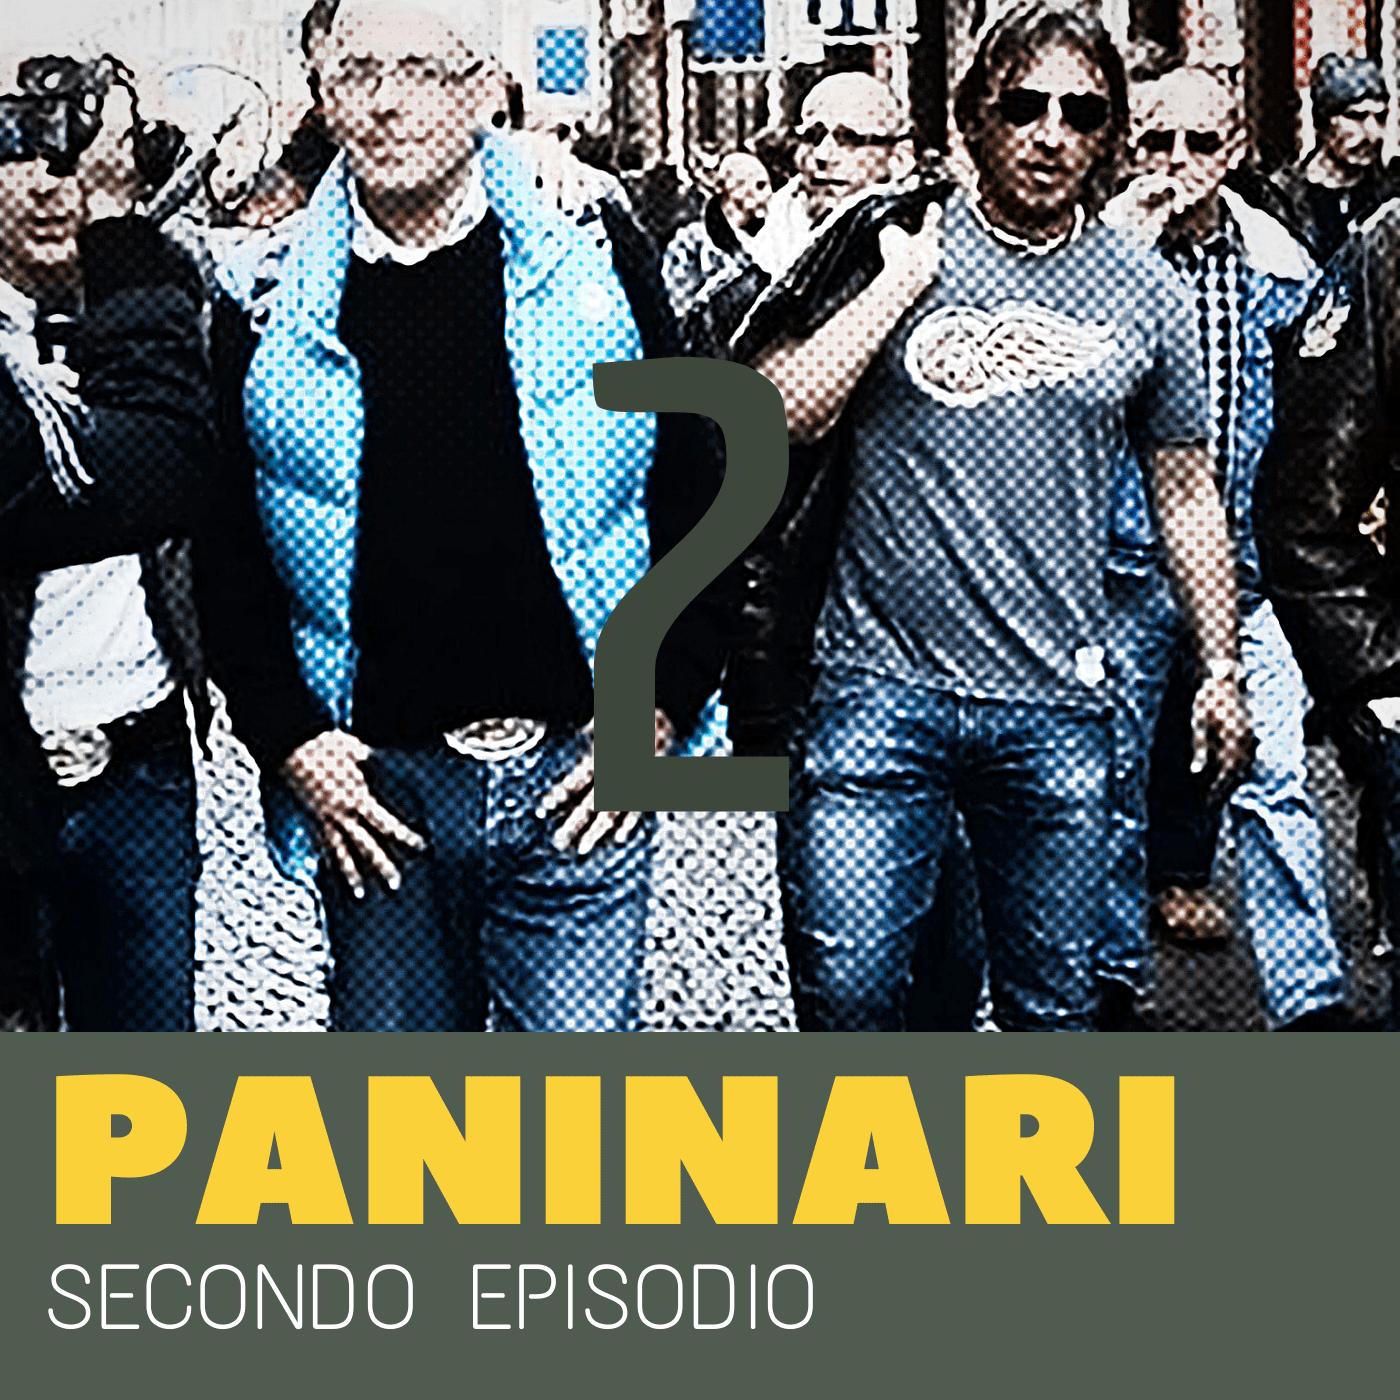 Podcast Paninari Episodio 2